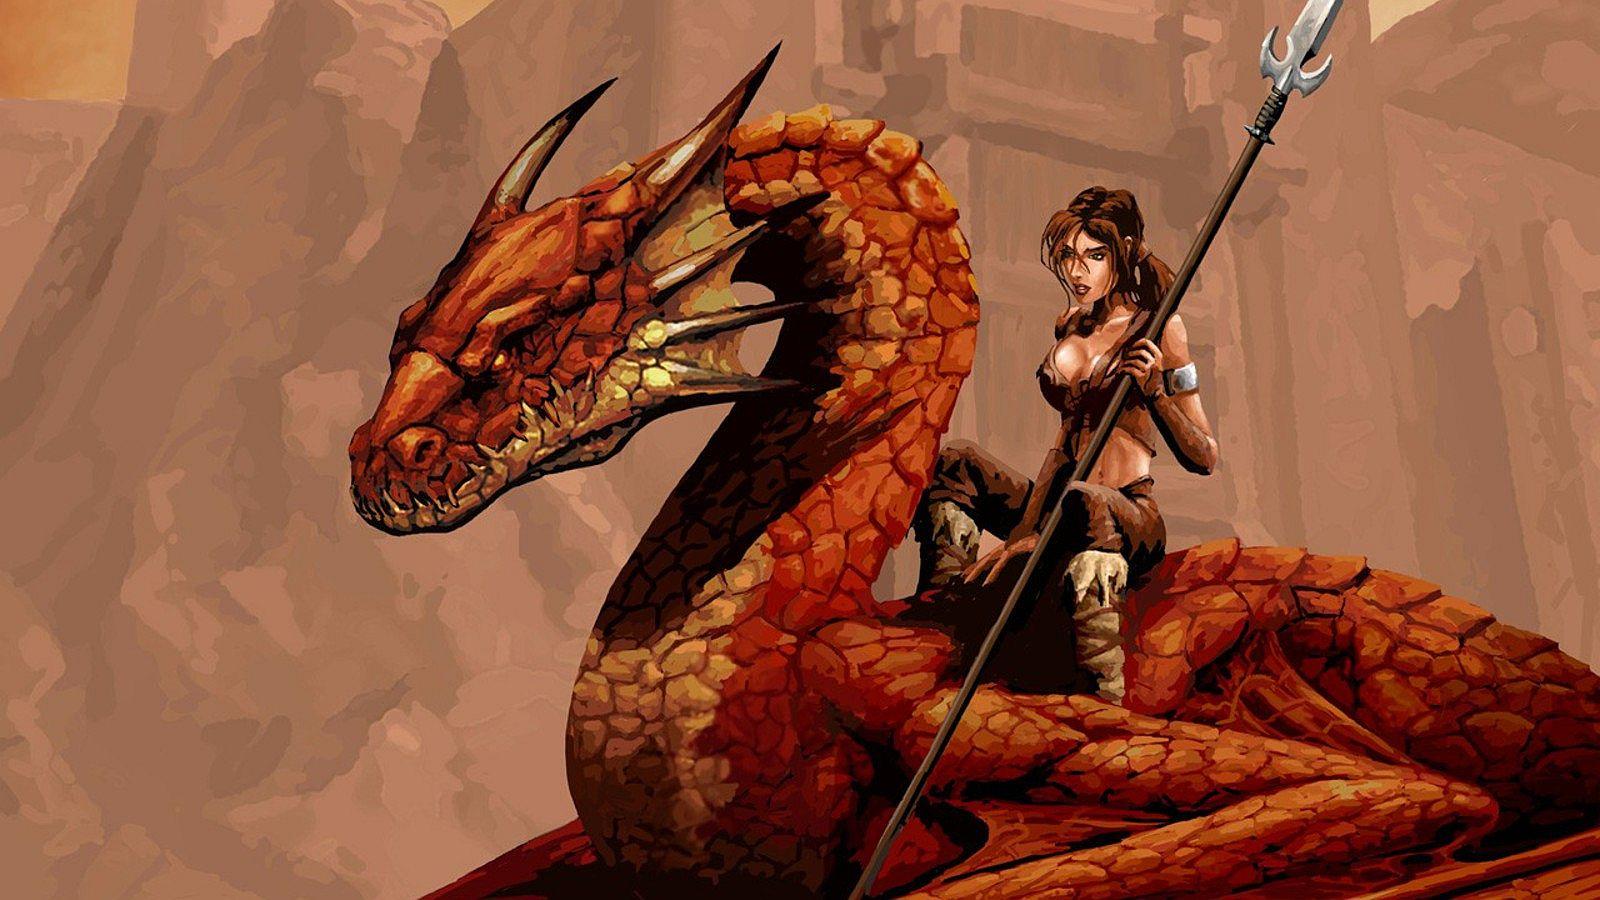 Drawn warrior dragon rider Dragon wallpaper riders Rider riders